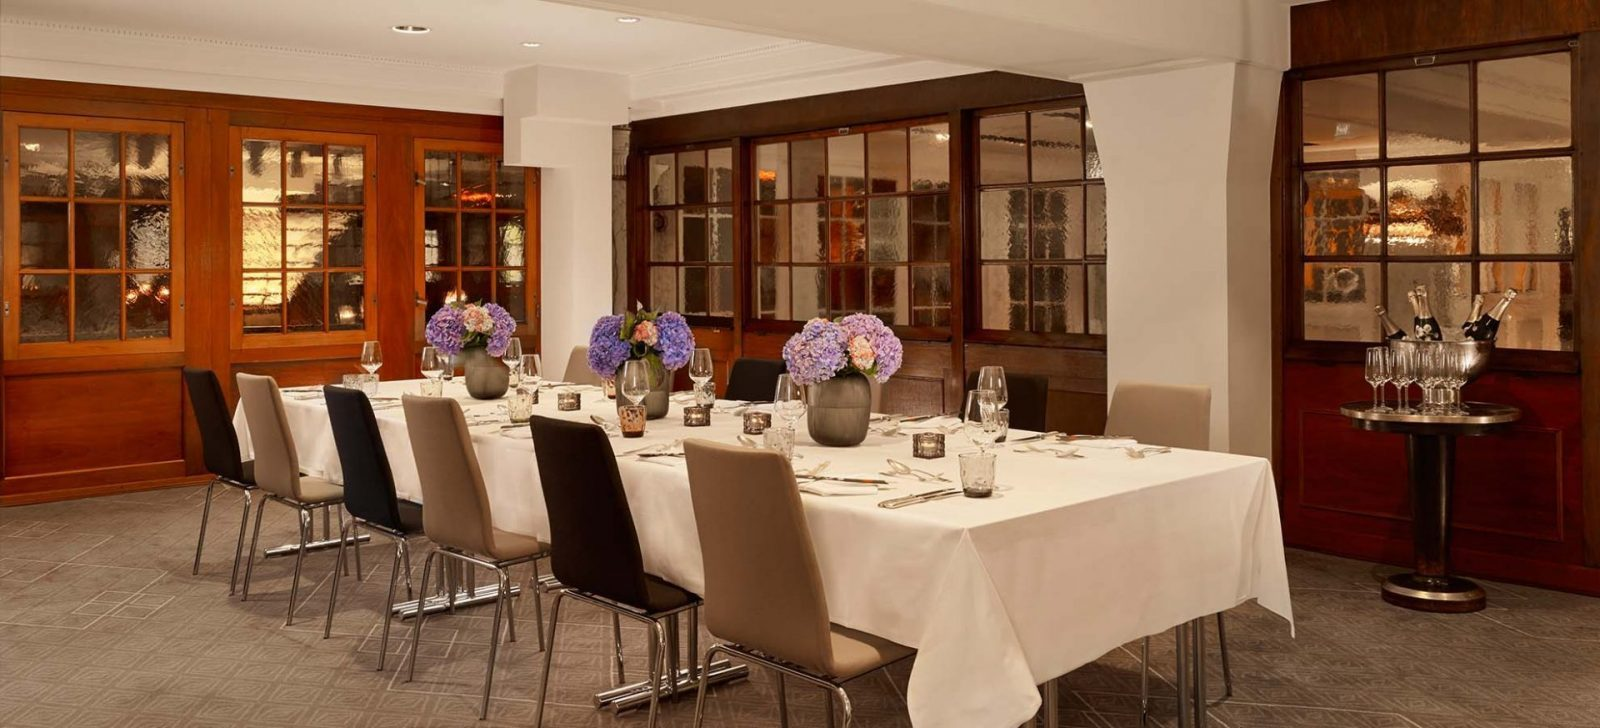 Reichshof Hotel Hamburg Tagungsraum Martha / Meeting room Martha